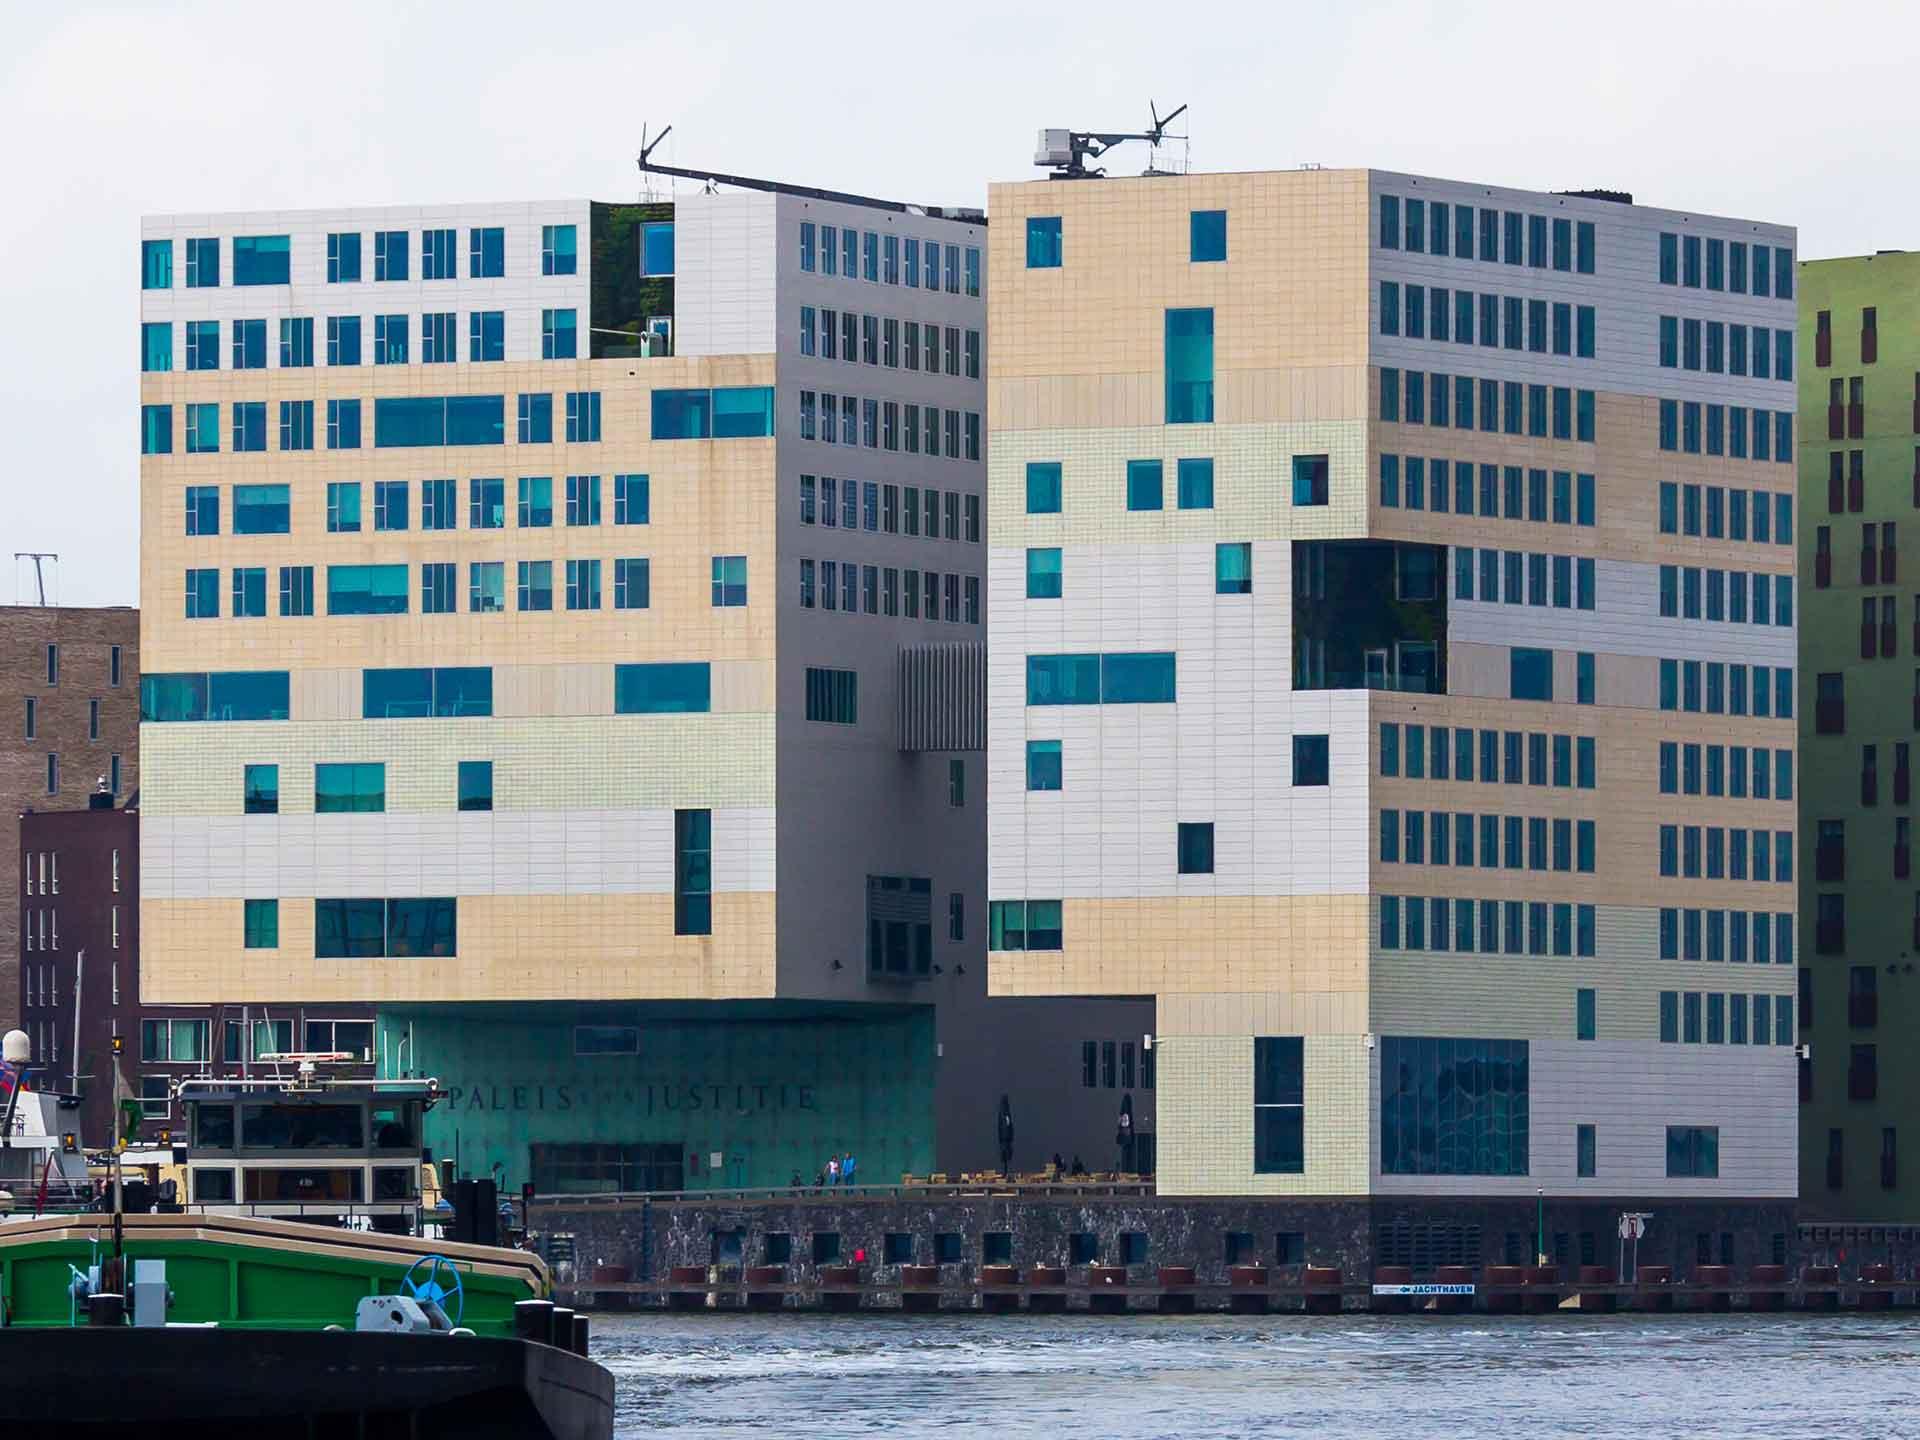 Rechtbank Amsterdam - Weening Strafrechtadvocaten